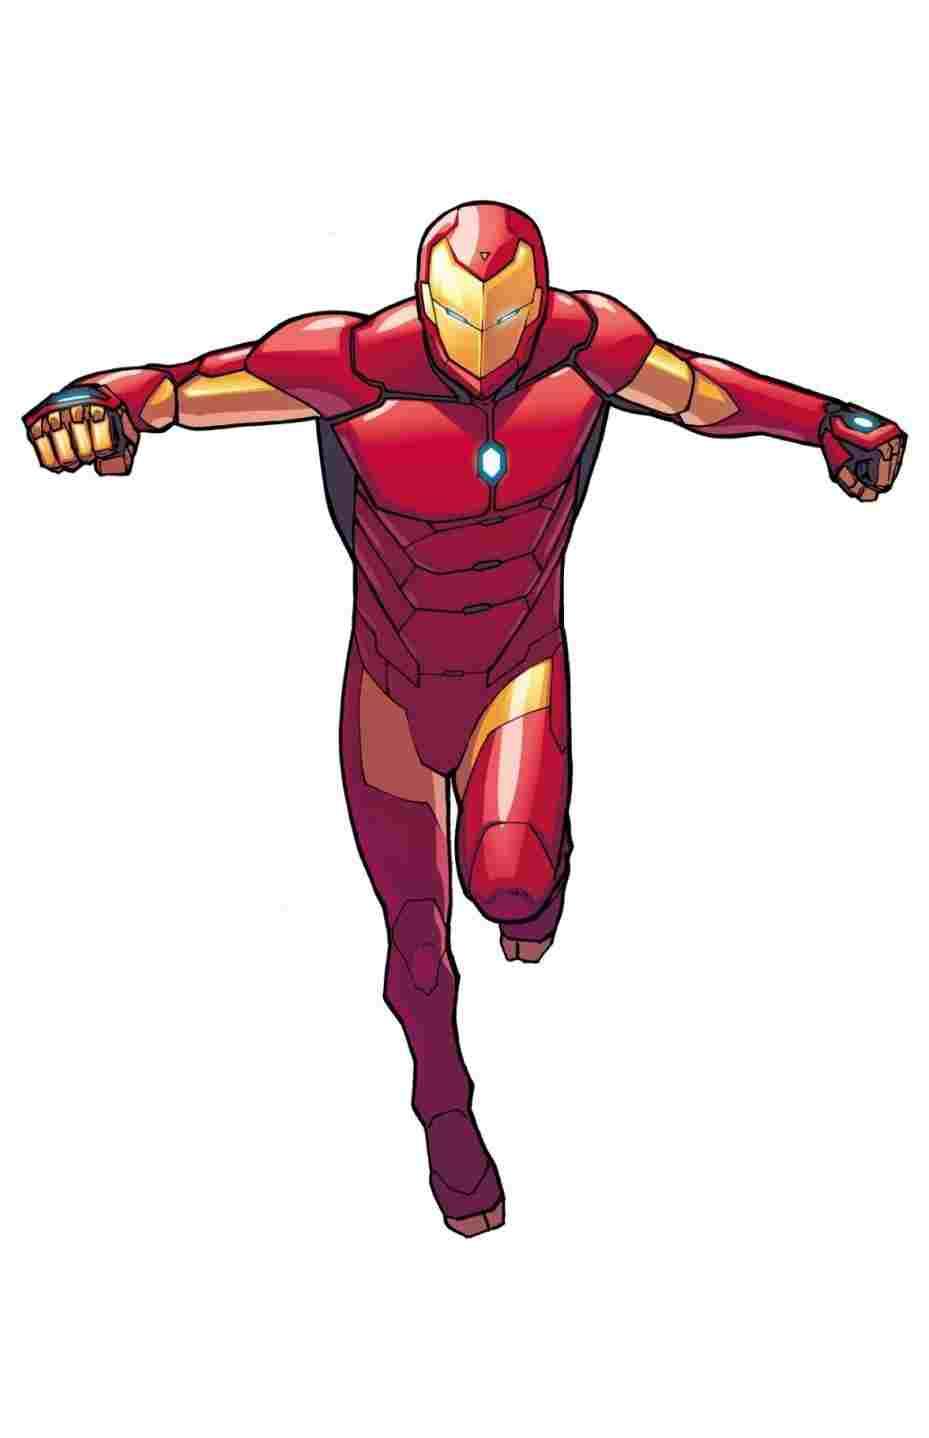 929x1438 Iron Man Drawing Colored Full Body